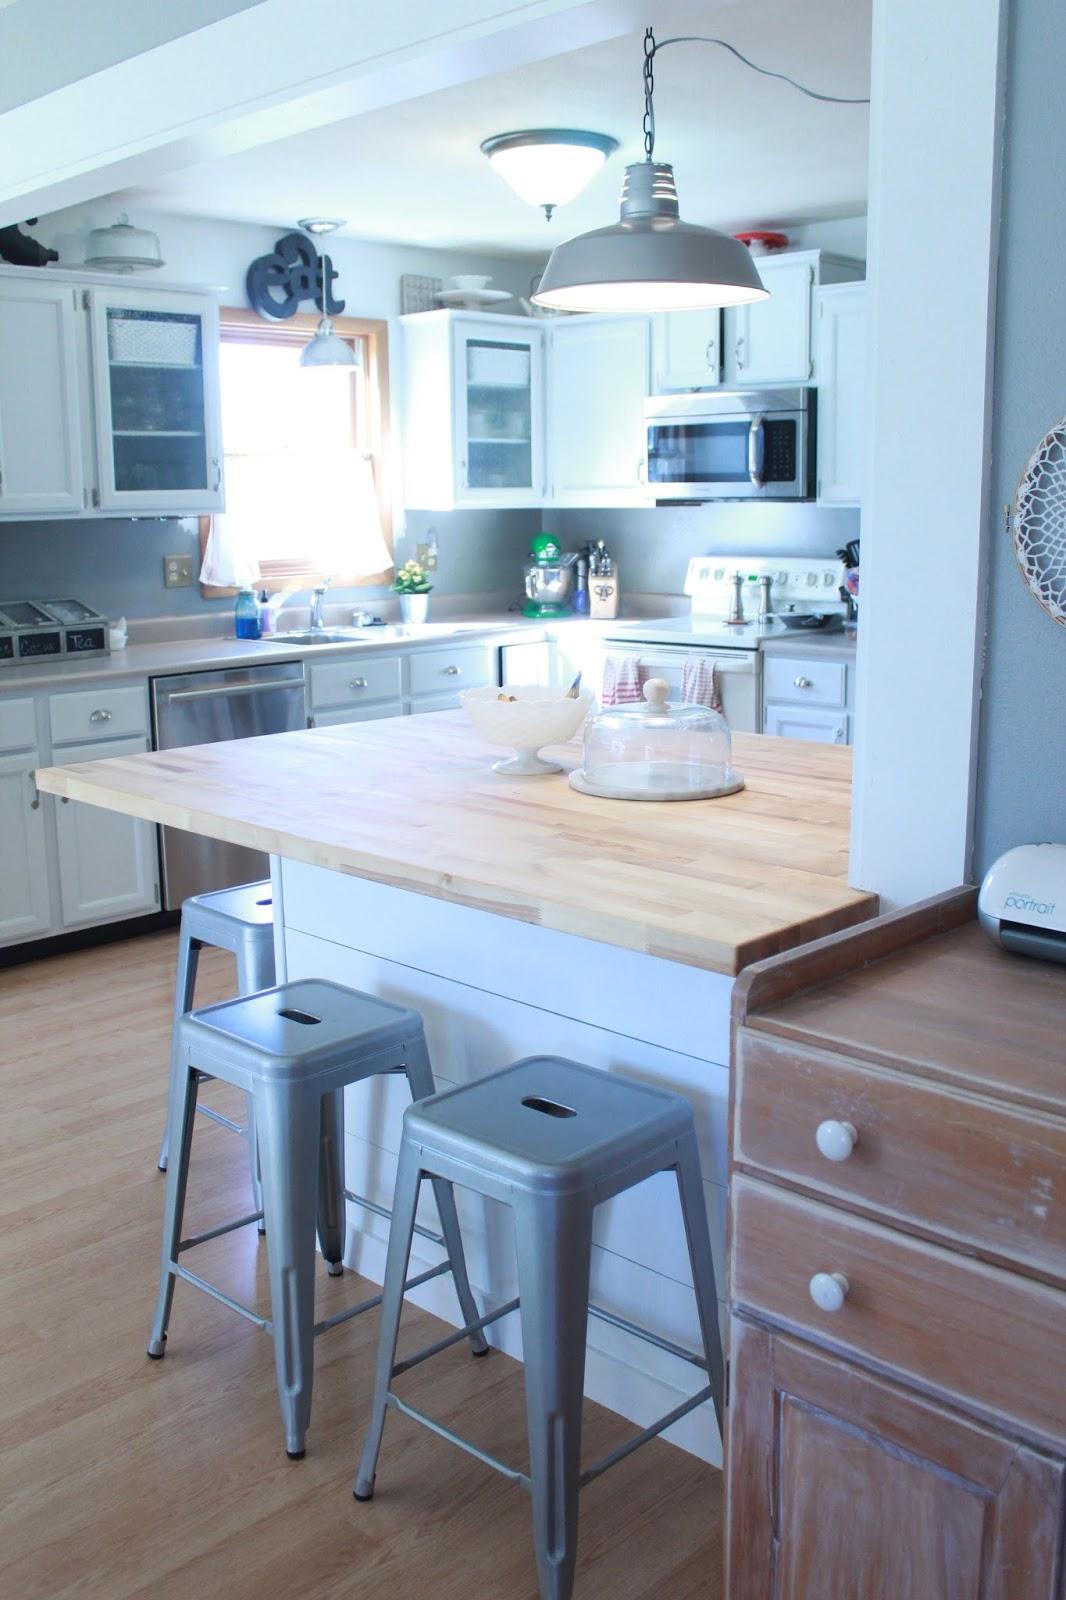 Making Our Nest: Kitchen island, take 2